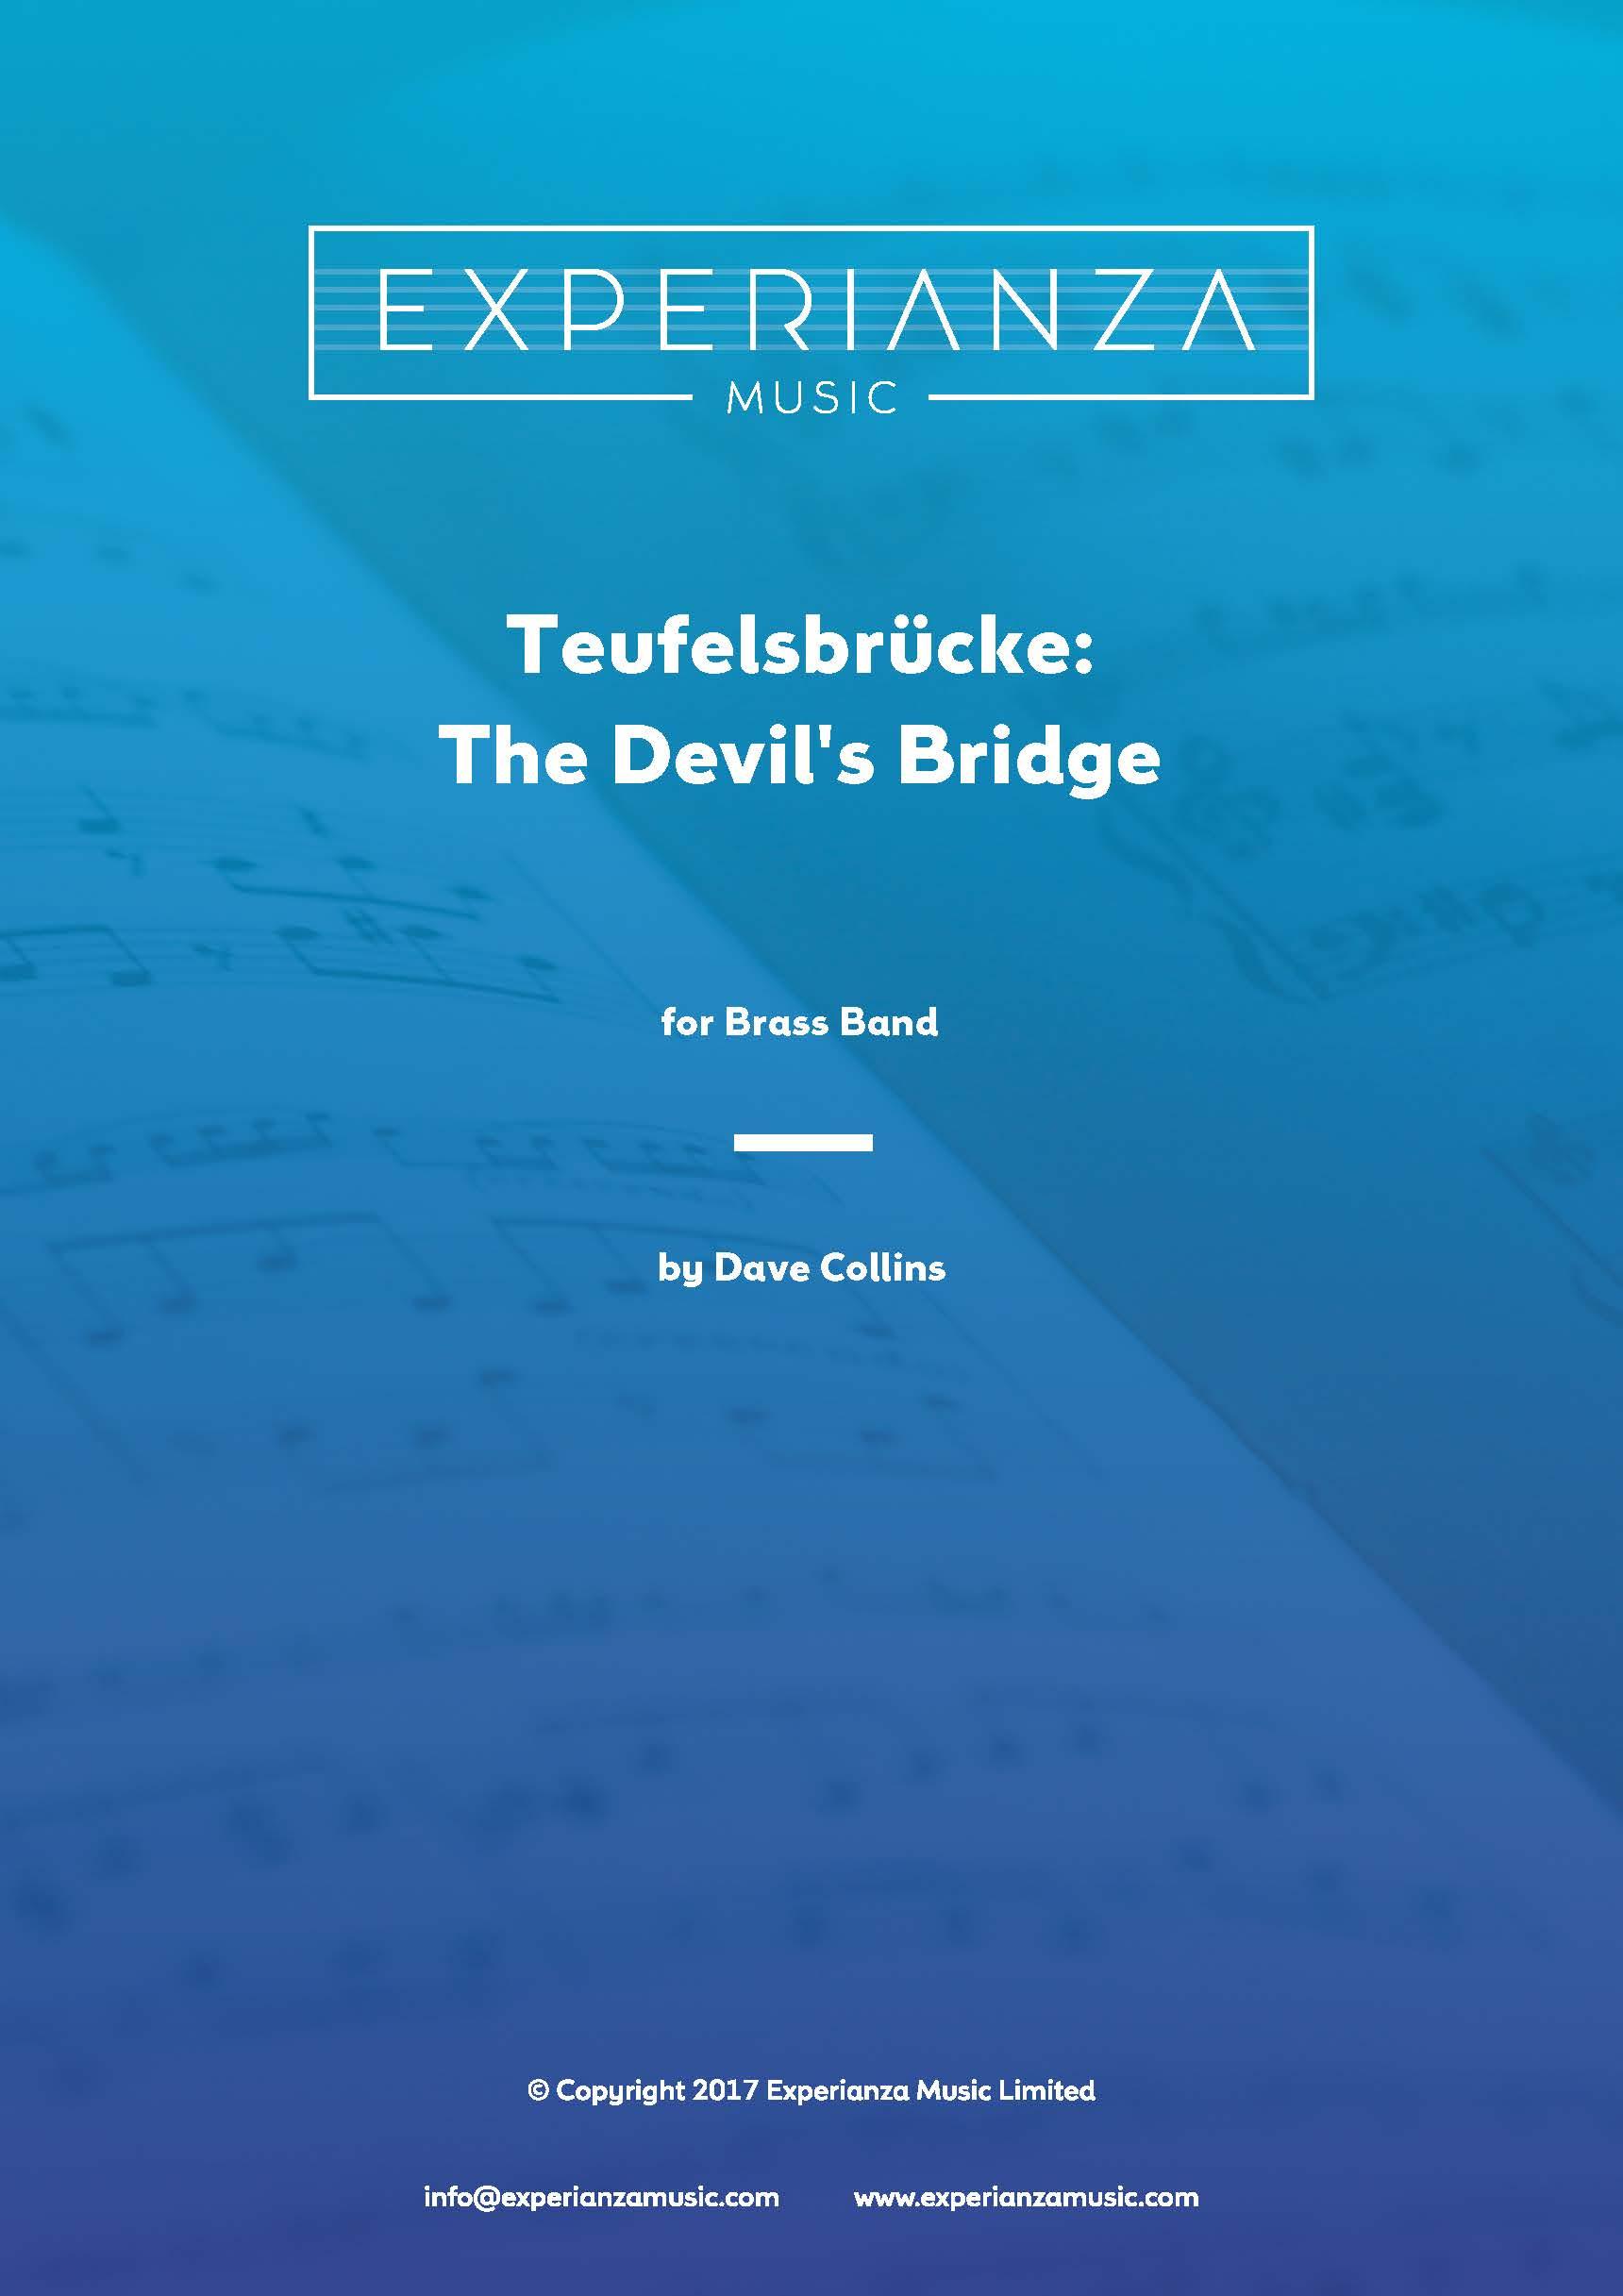 Teufelsbrucke (The Devil's Bridge) (Brass Band - Score and Parts)